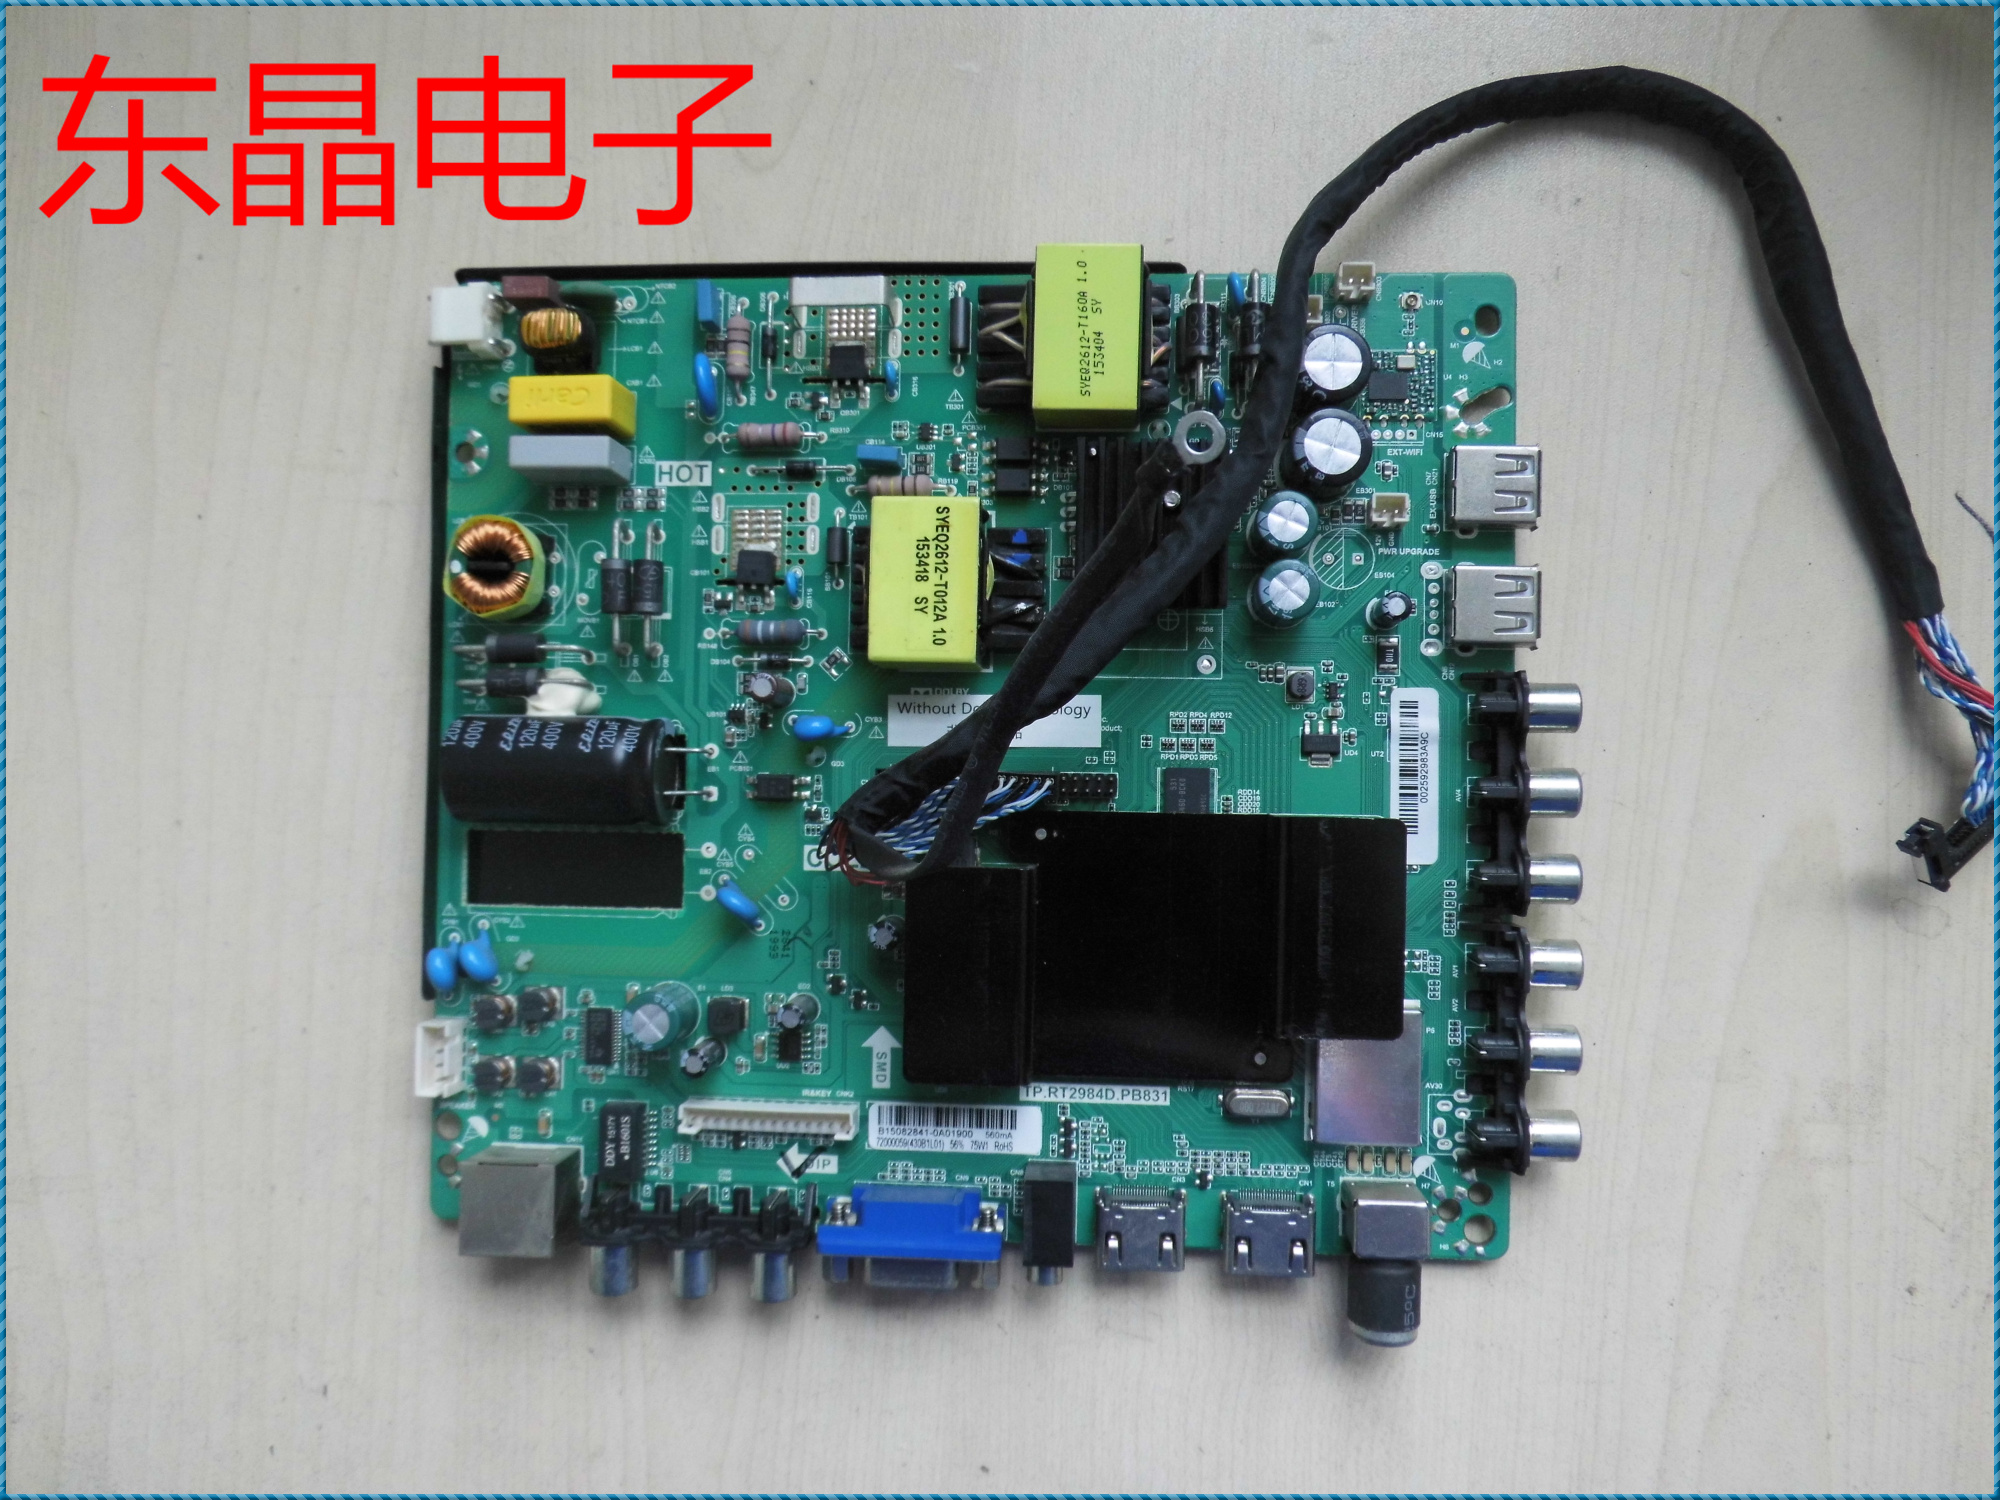 原裝KKTV K43主板TP.RT2984D.PB831 屏0059YT GK